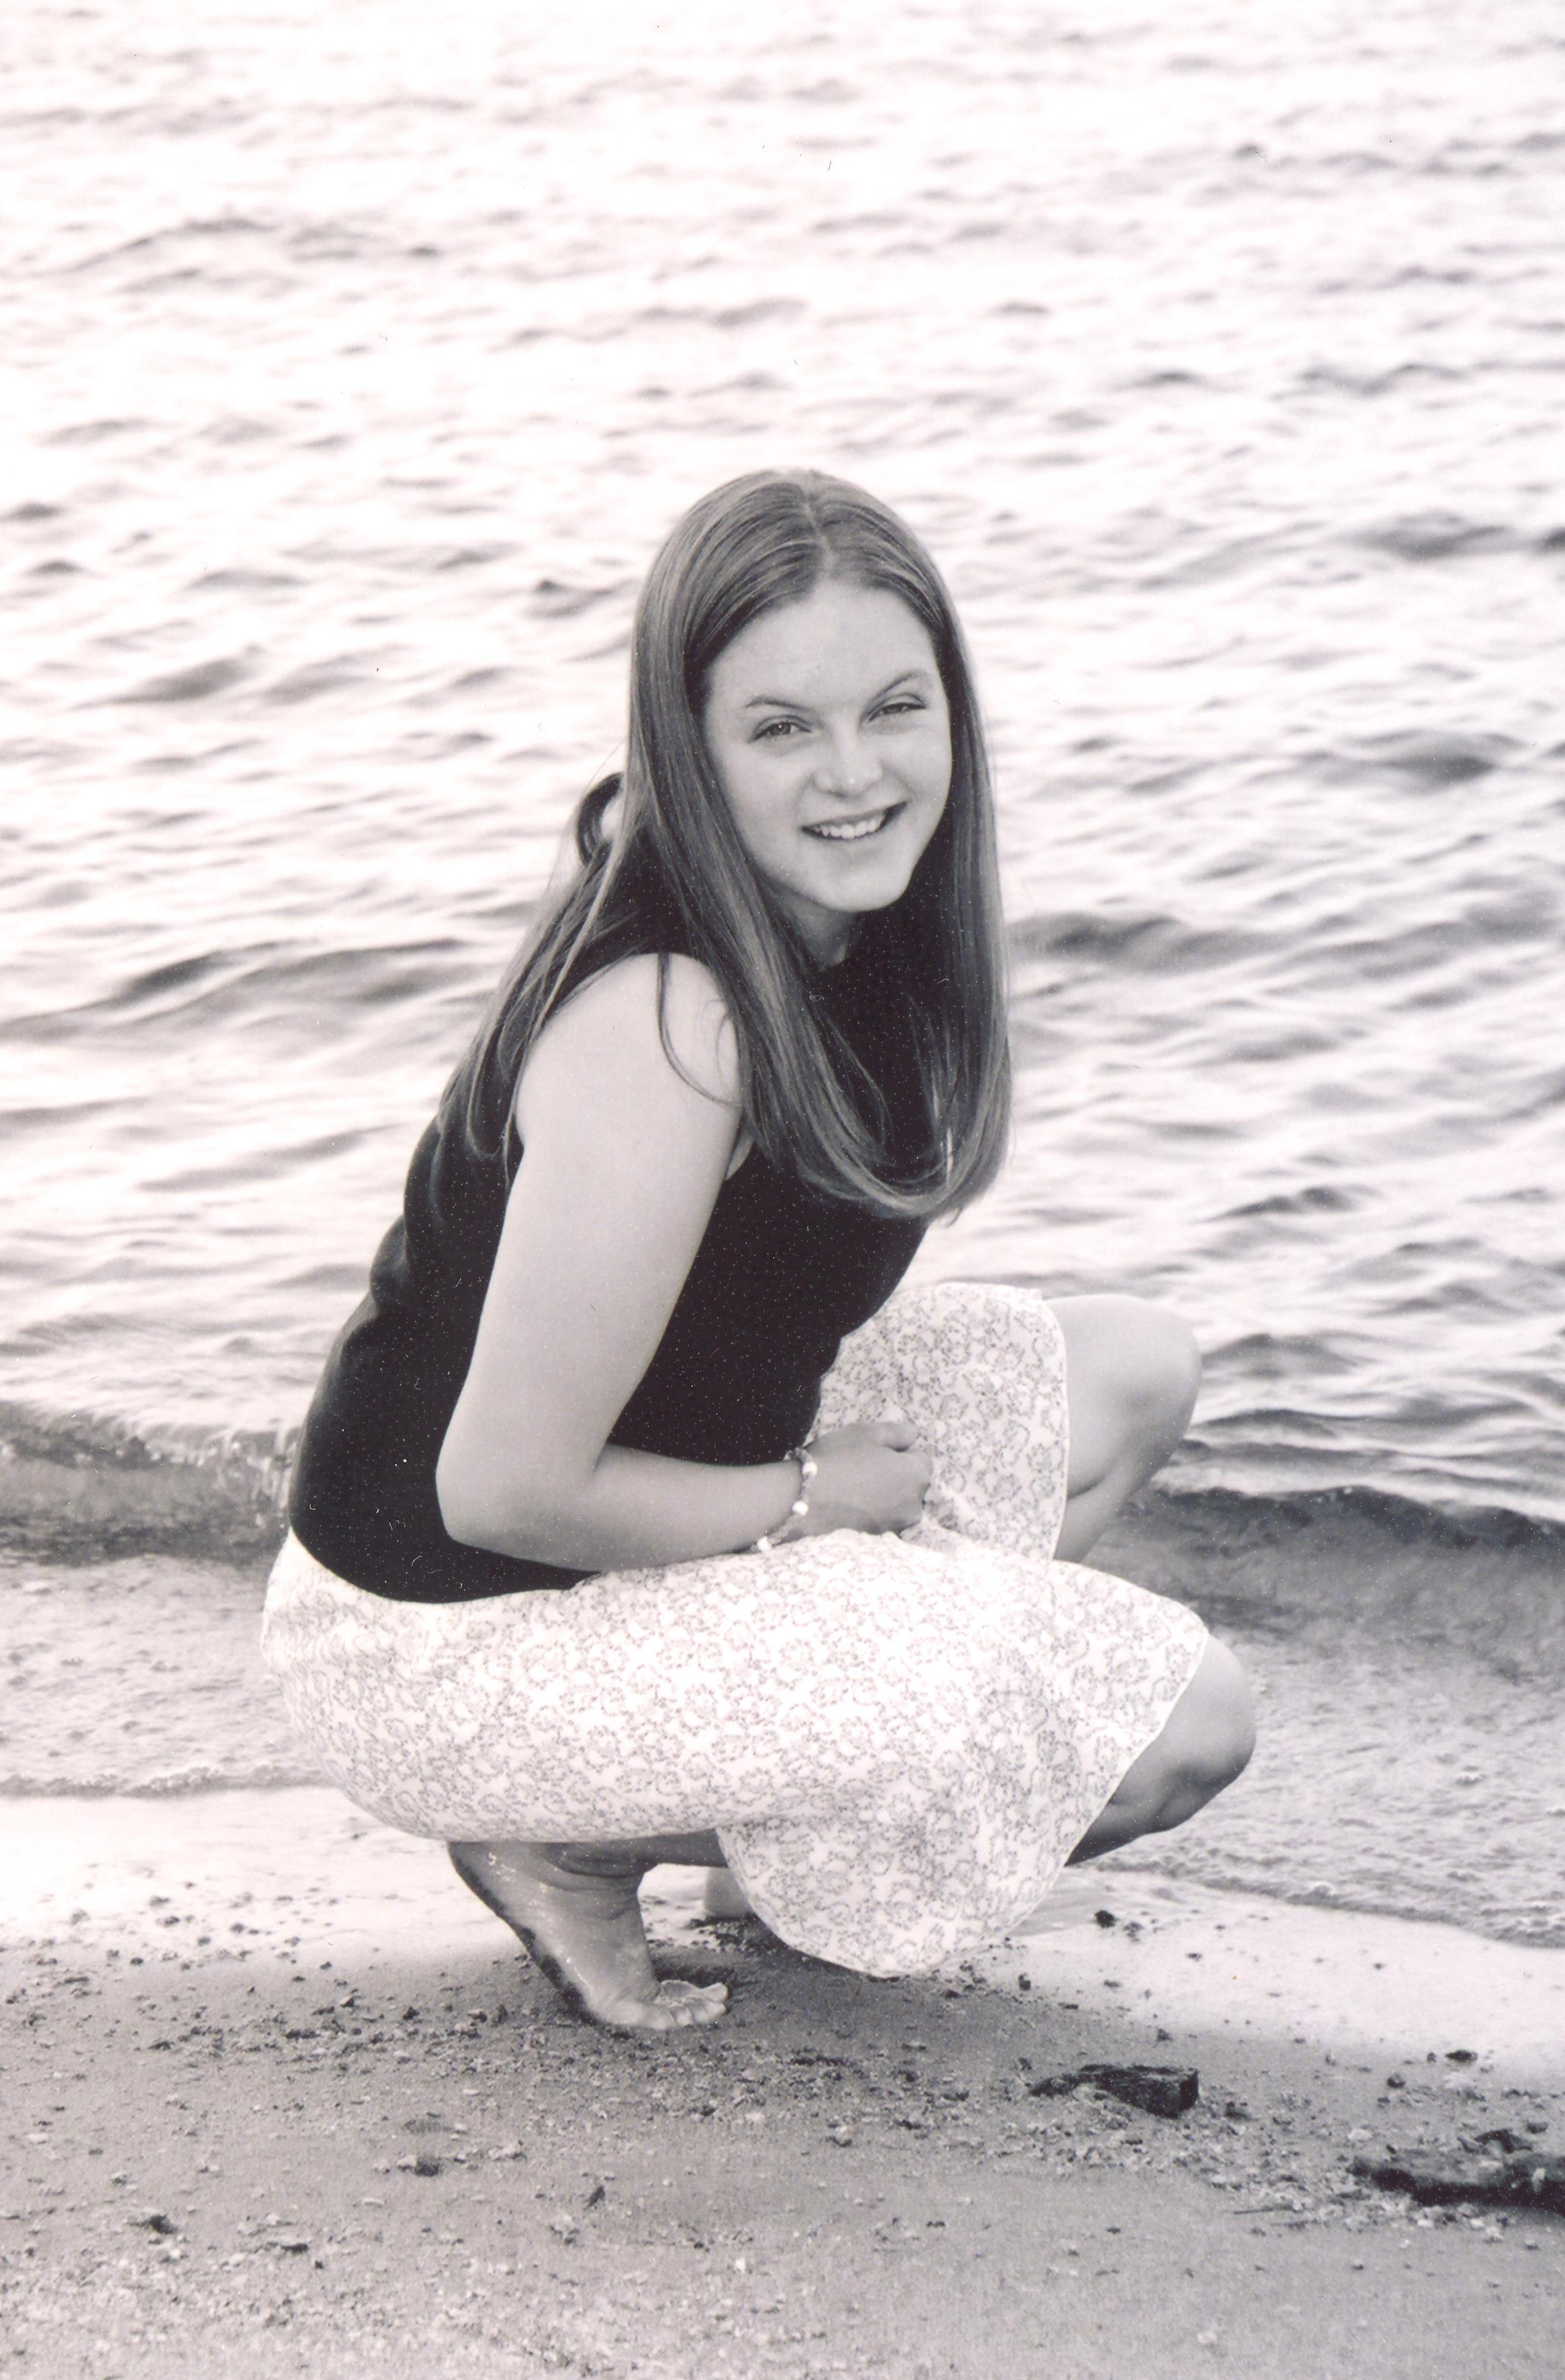 Jennifer M. Sutliff, age 30, of Helena